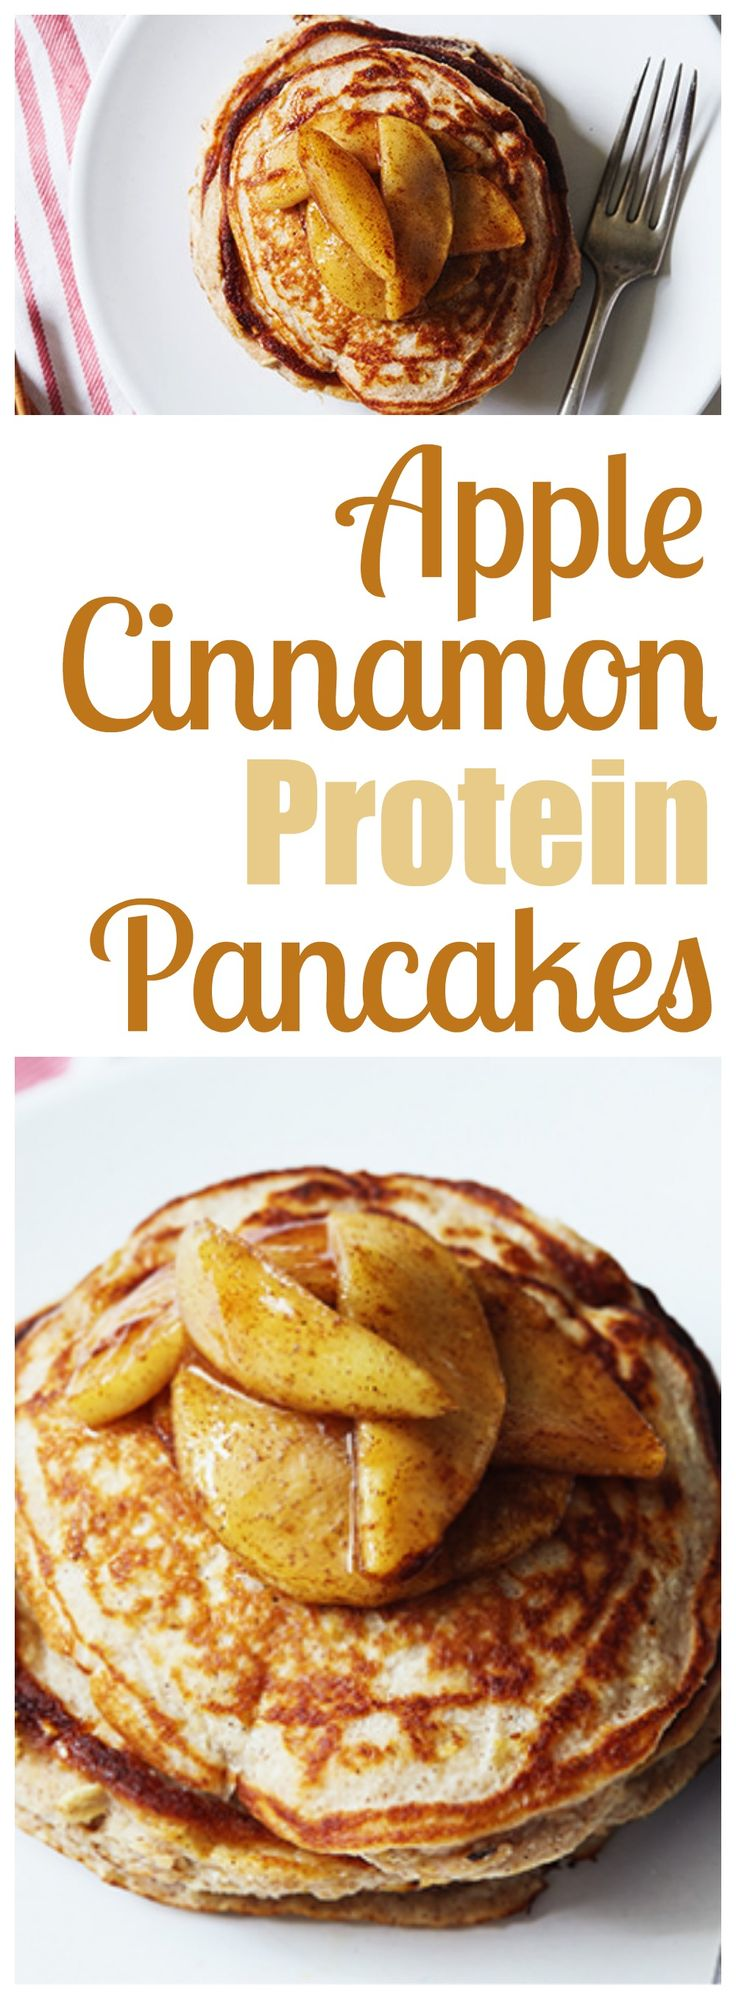 Apple Cinnamon Protein Pancakes - 21 Day Fix friendly